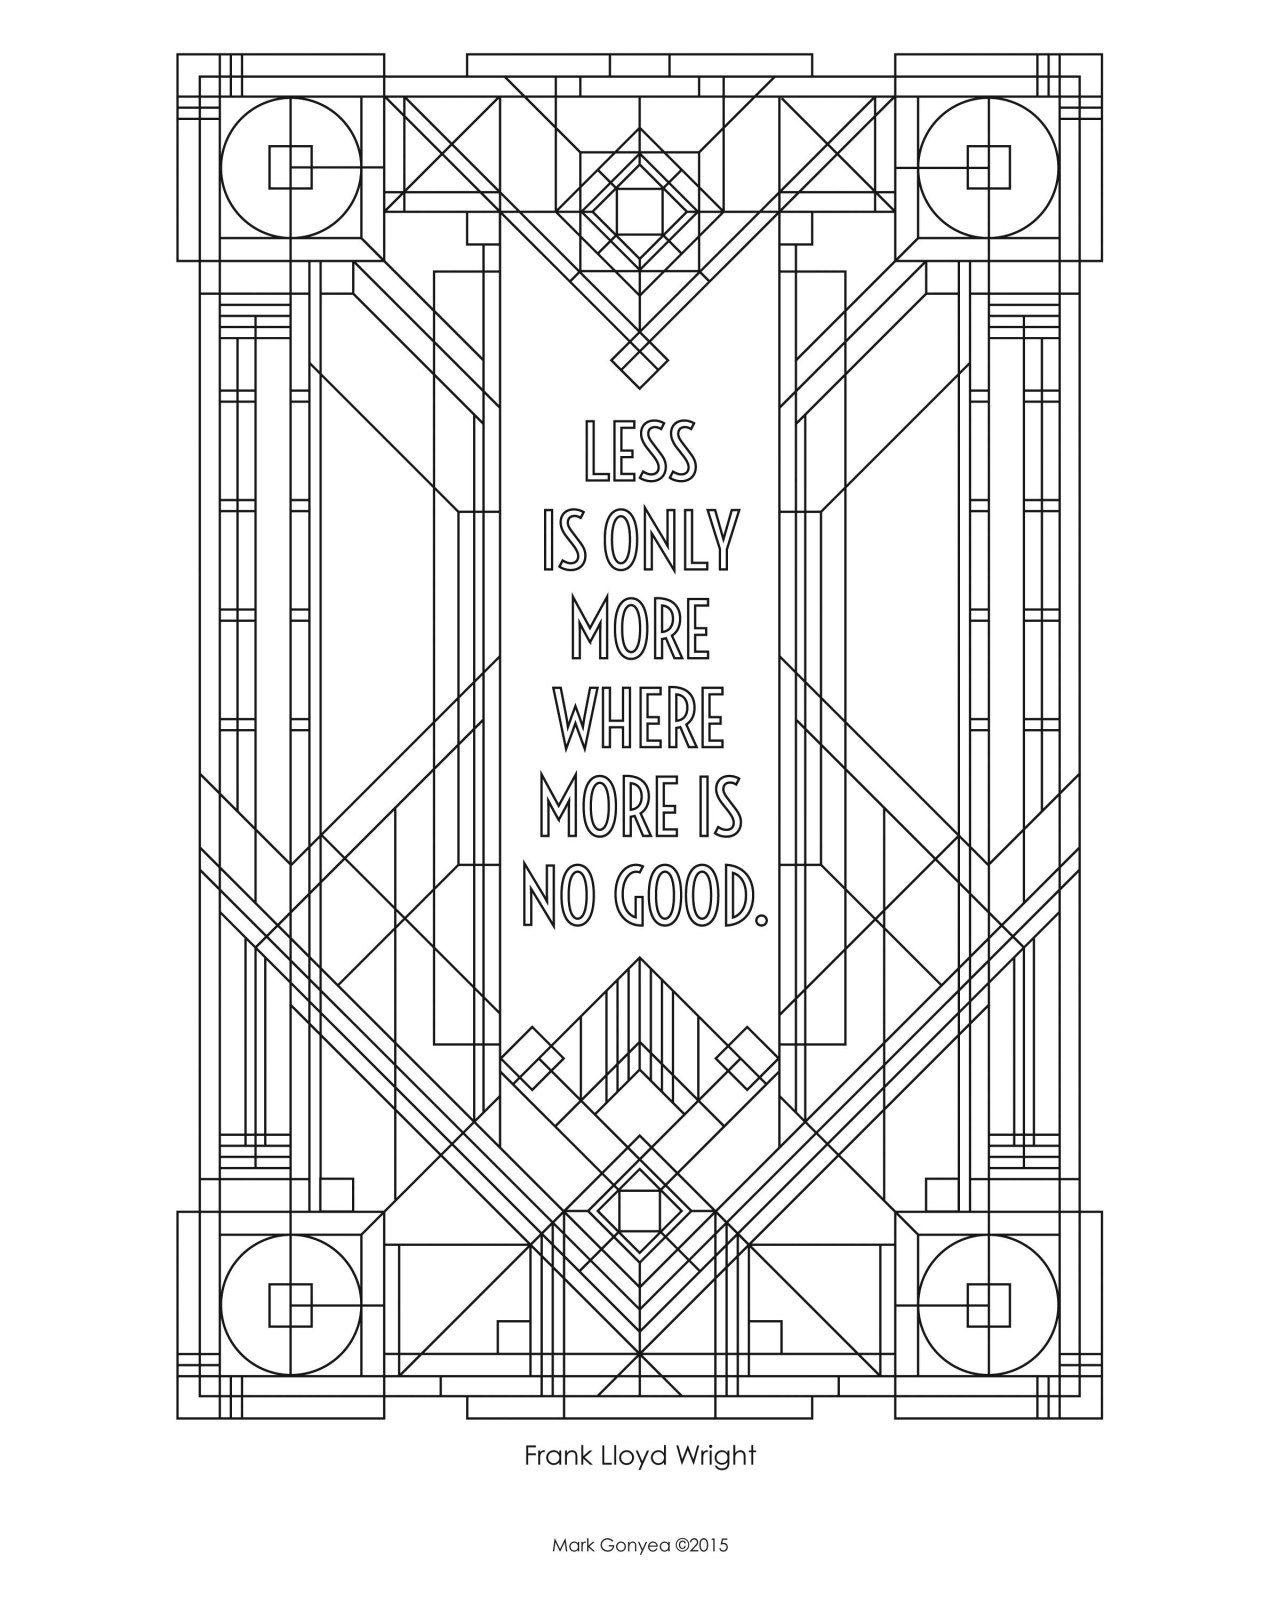 Pin On Frank Lloyd Wright